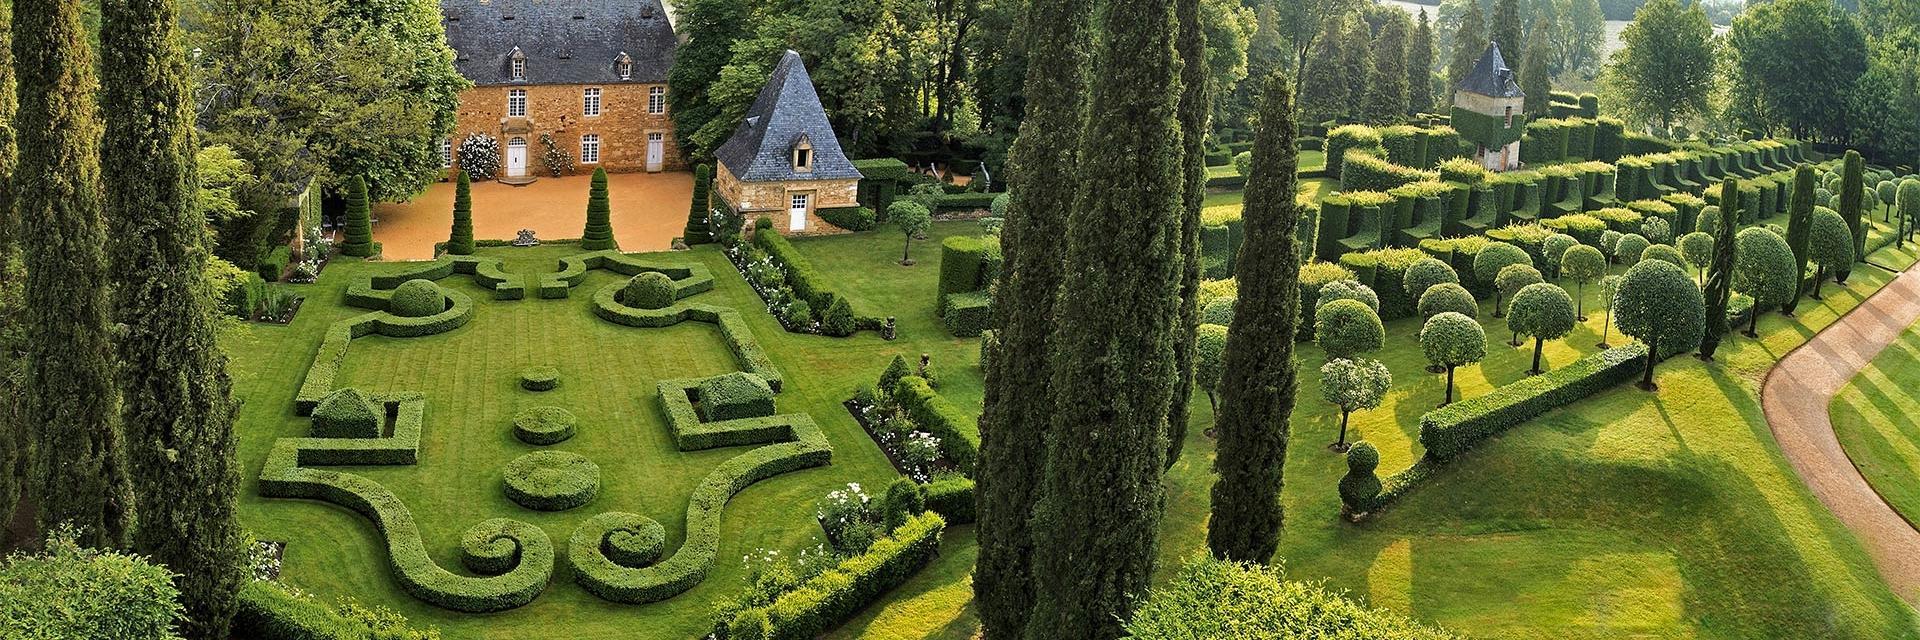 Eyrignac jardins